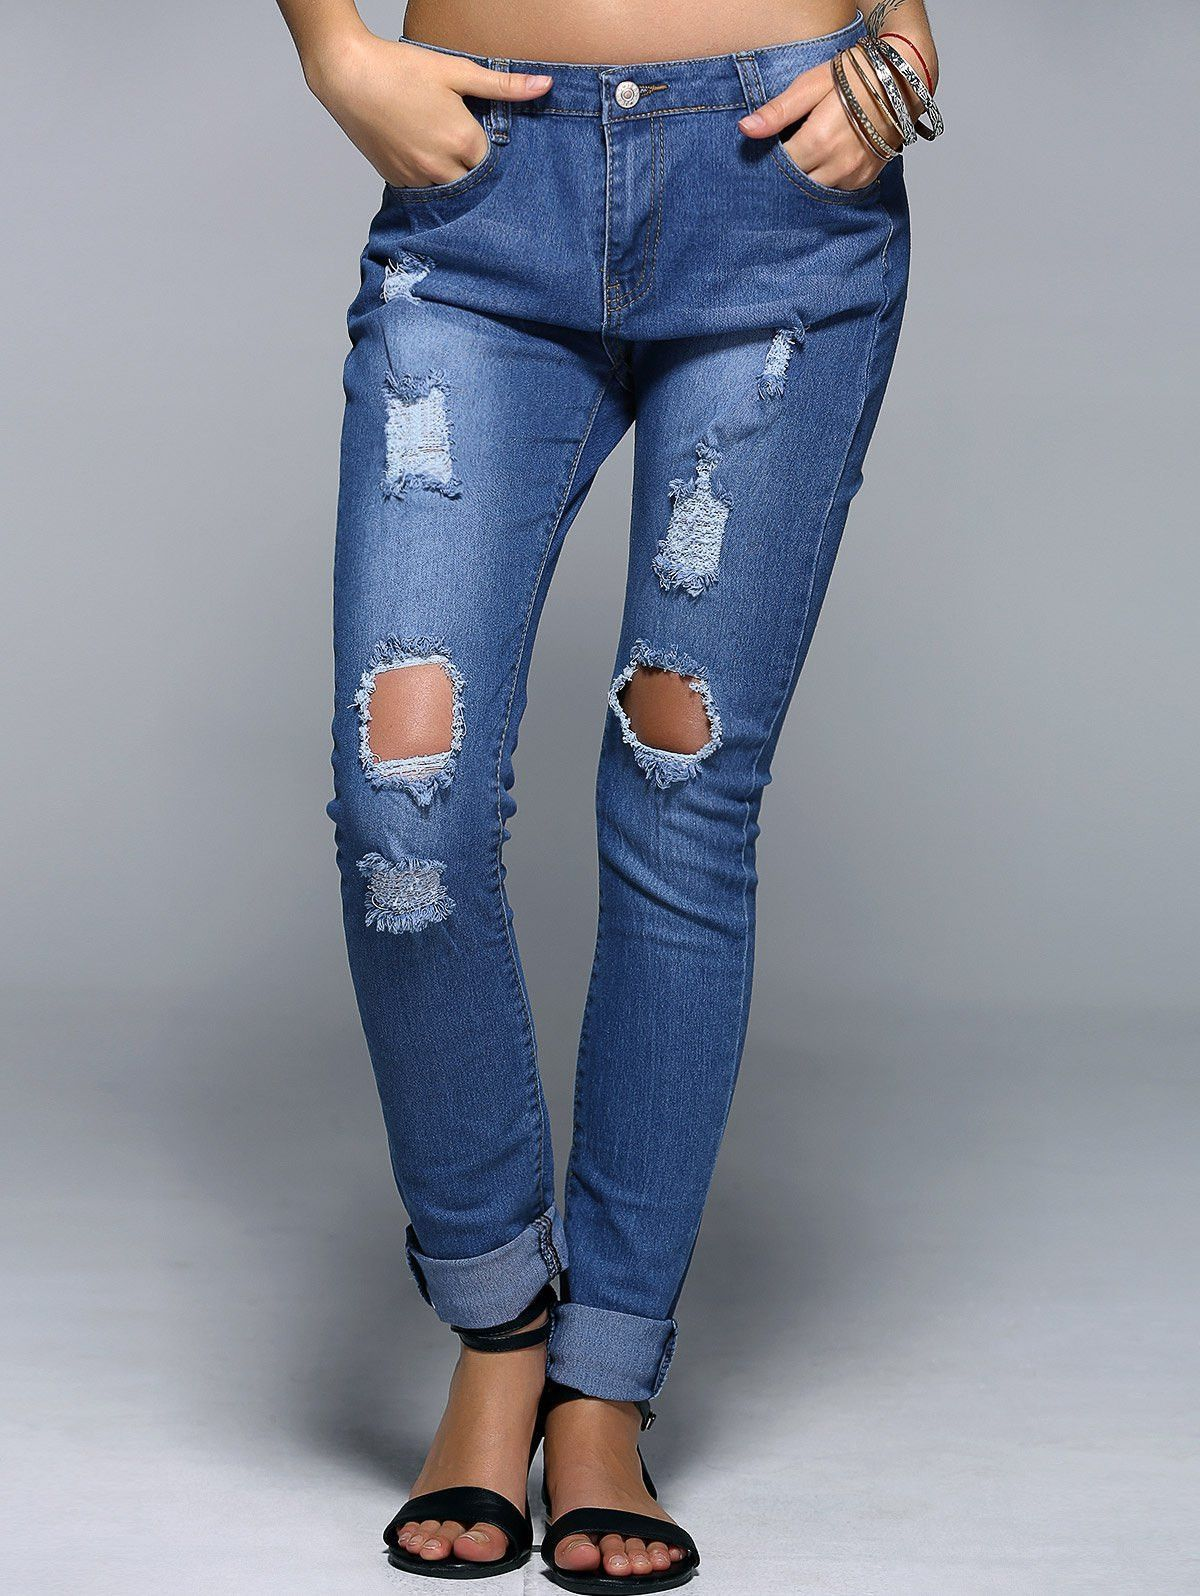 Carina Boyfriend Style Rippped Jeans